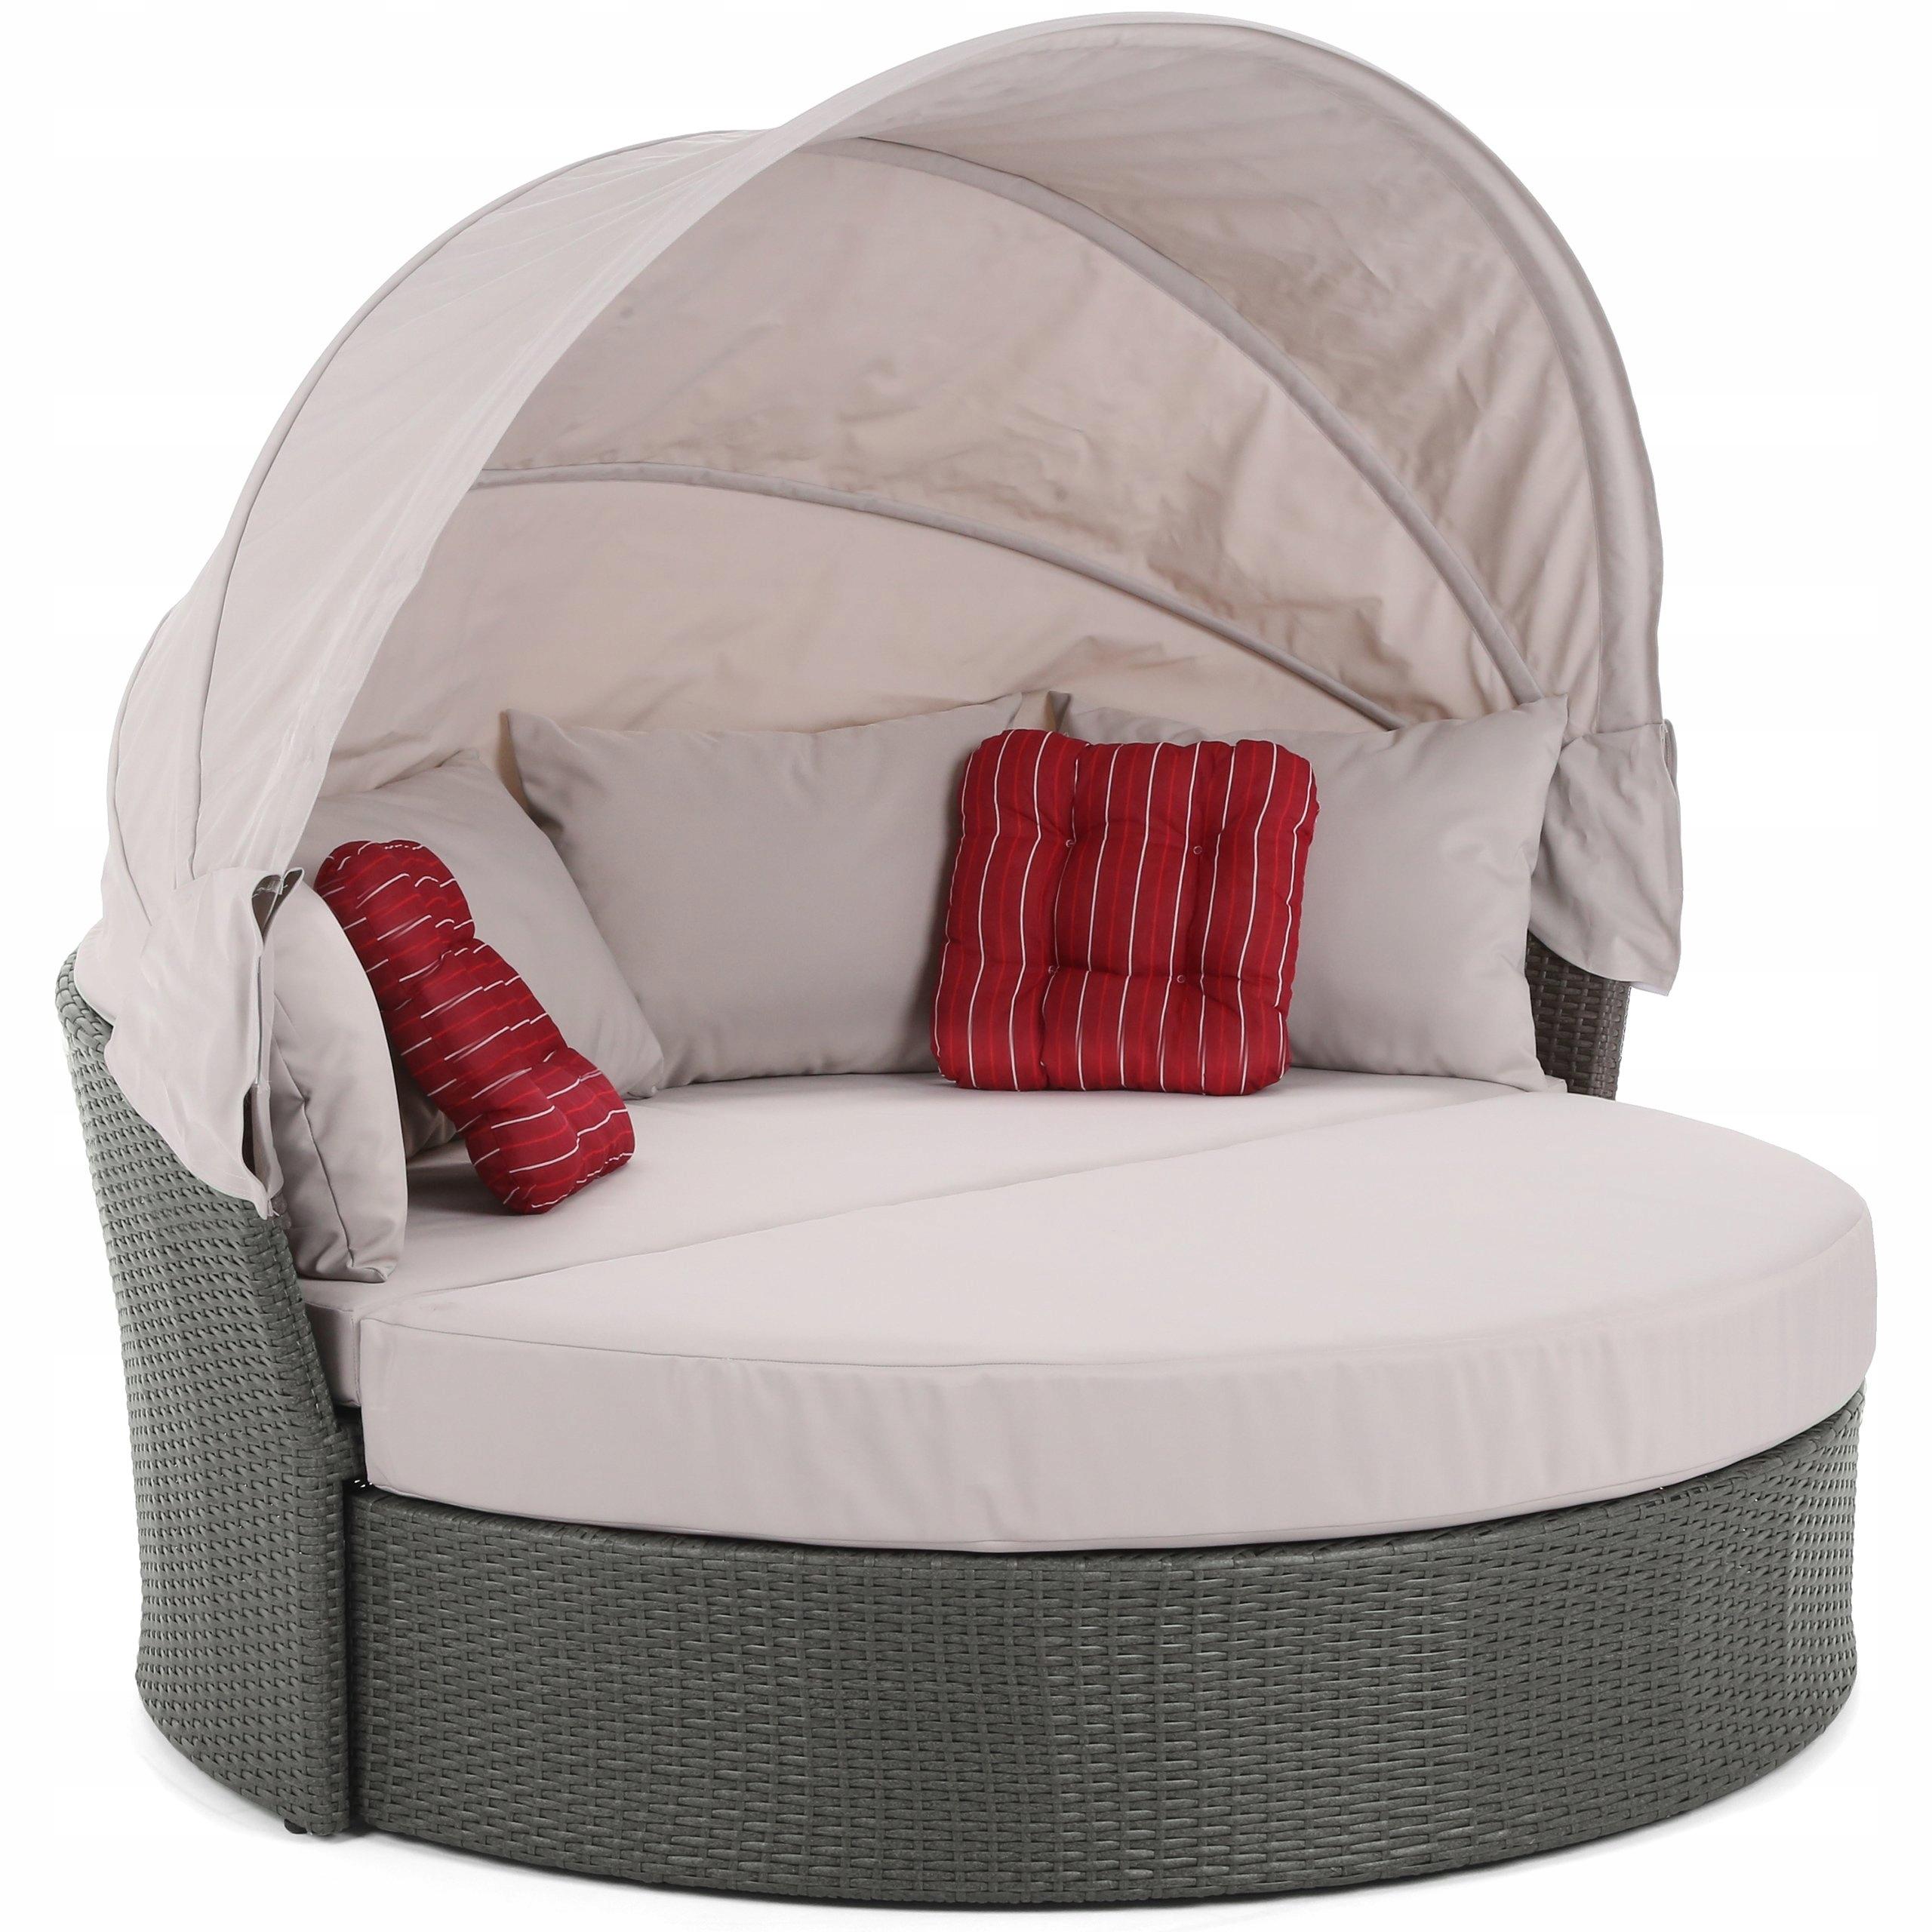 Meble Ogrodowe Sofa Technorattanowa Ratan Taras 7281437253